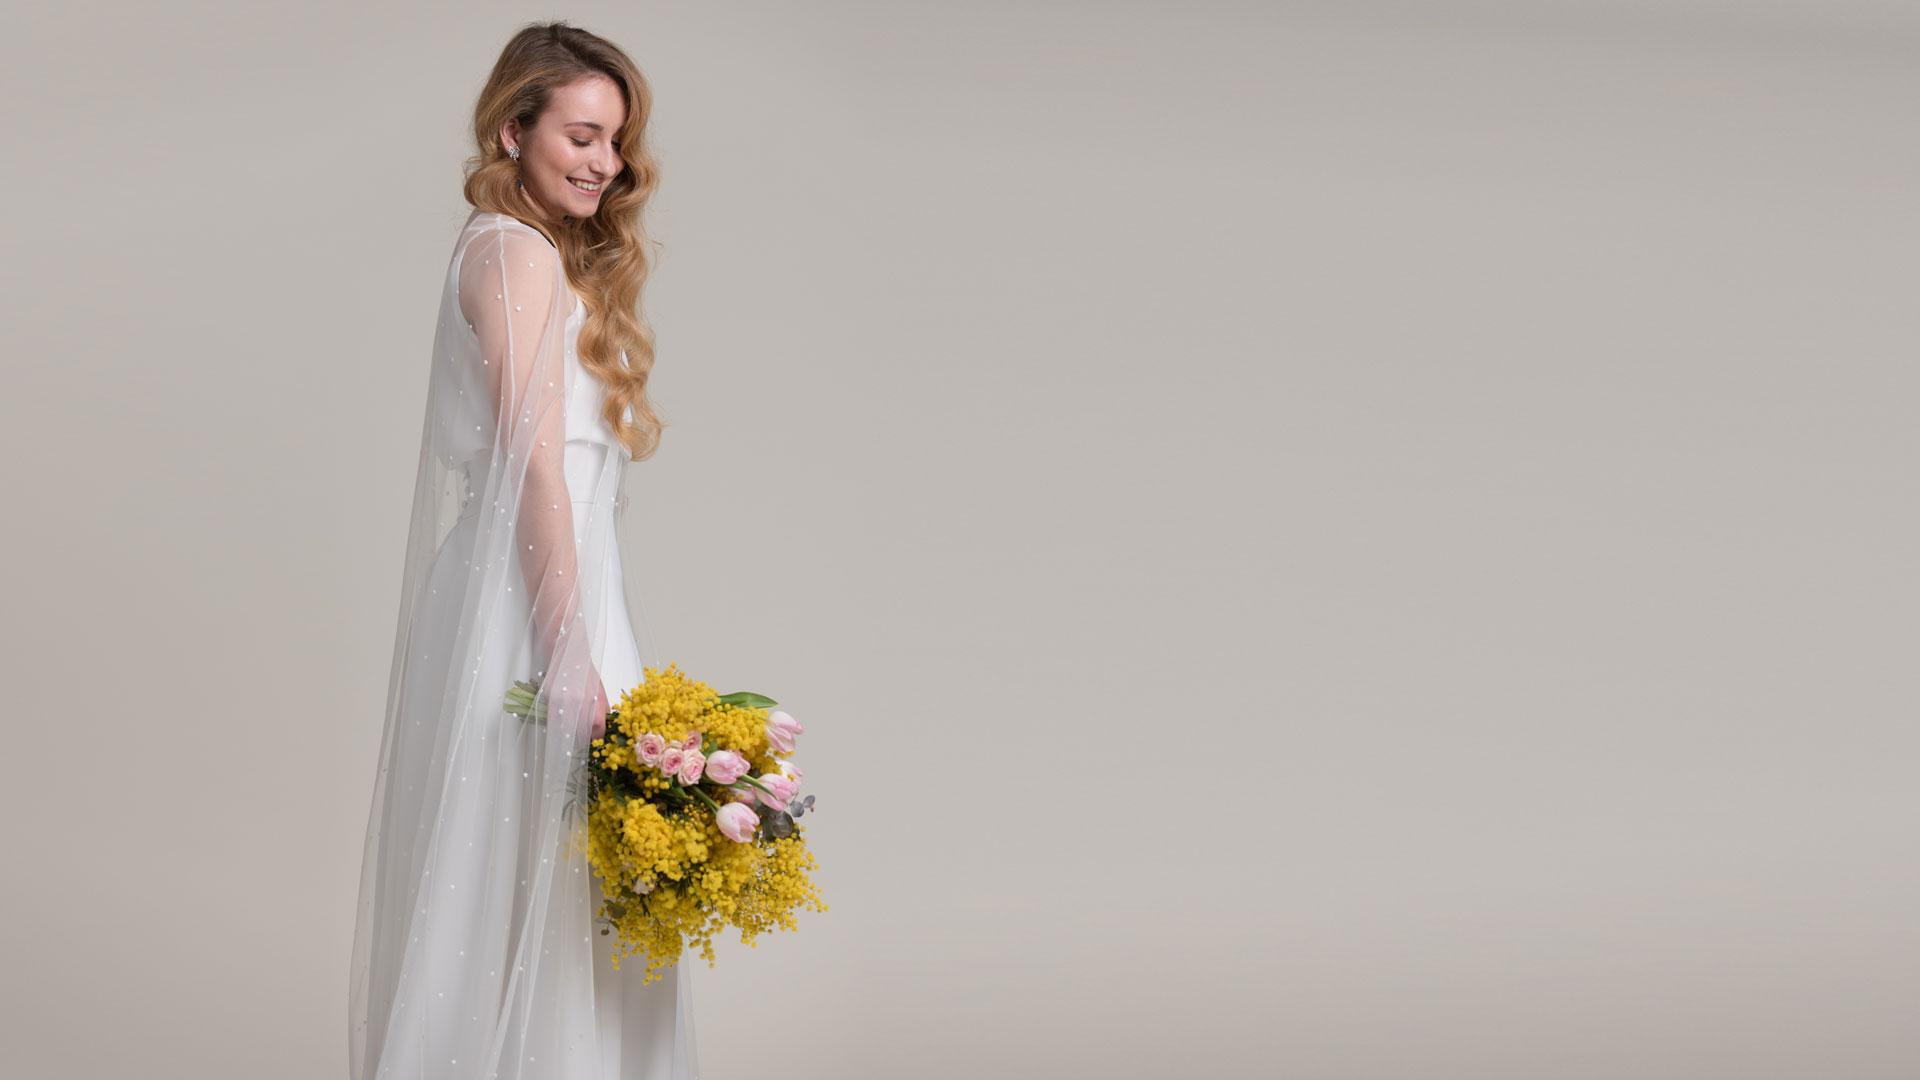 NANANA VIDEO Videos de boda en Zaragoza - VIDEO DE NOVIA DE INVIERNO